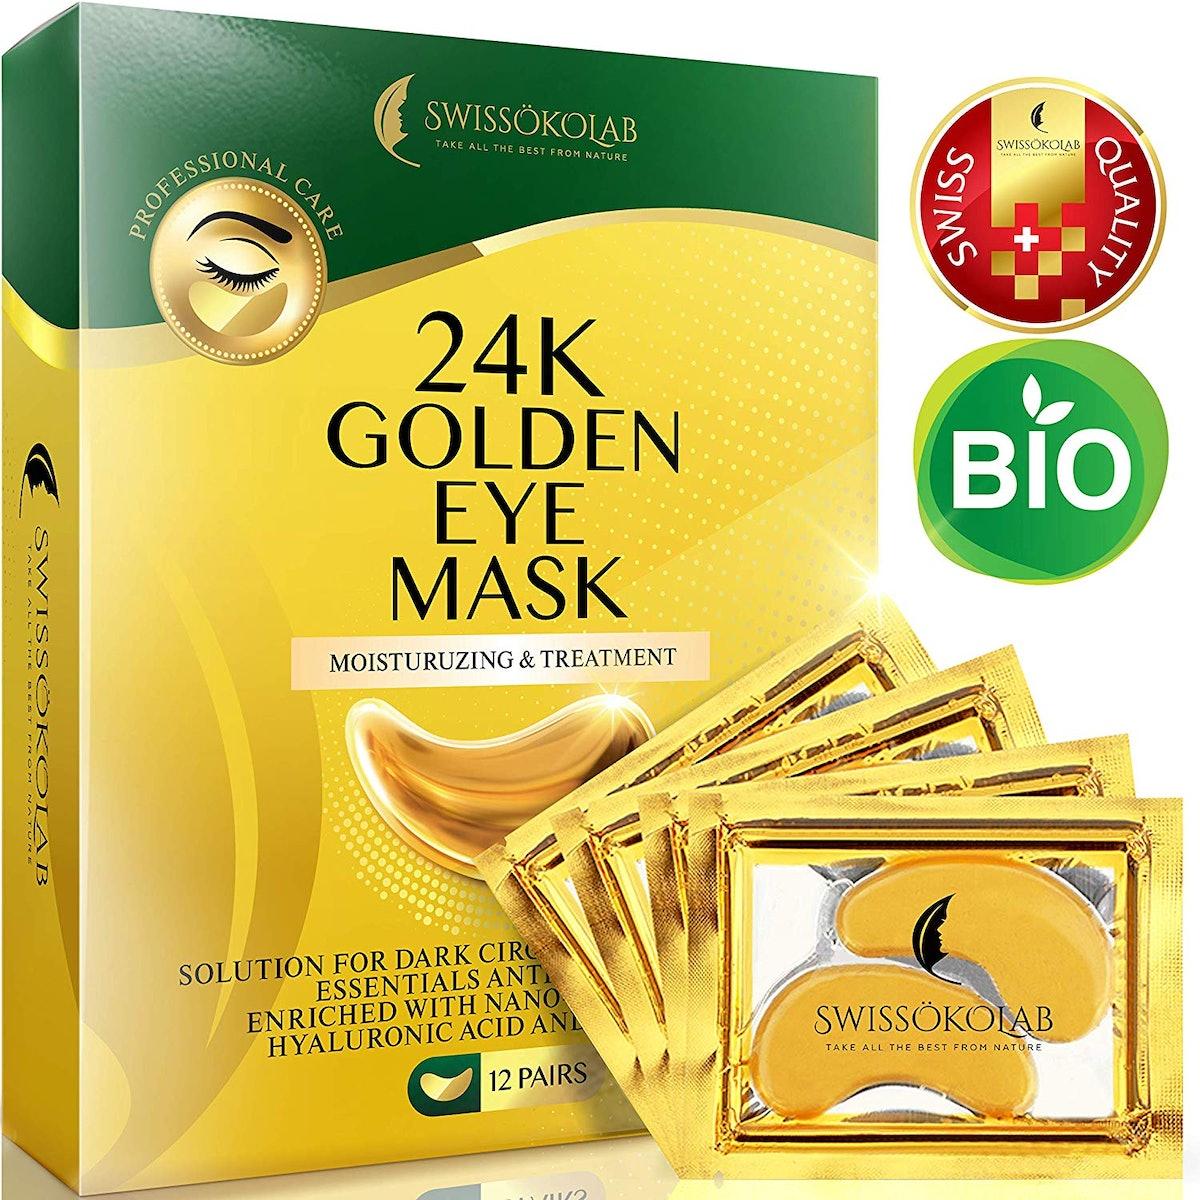 Swissoko Lab 24K Golden Eye Mask